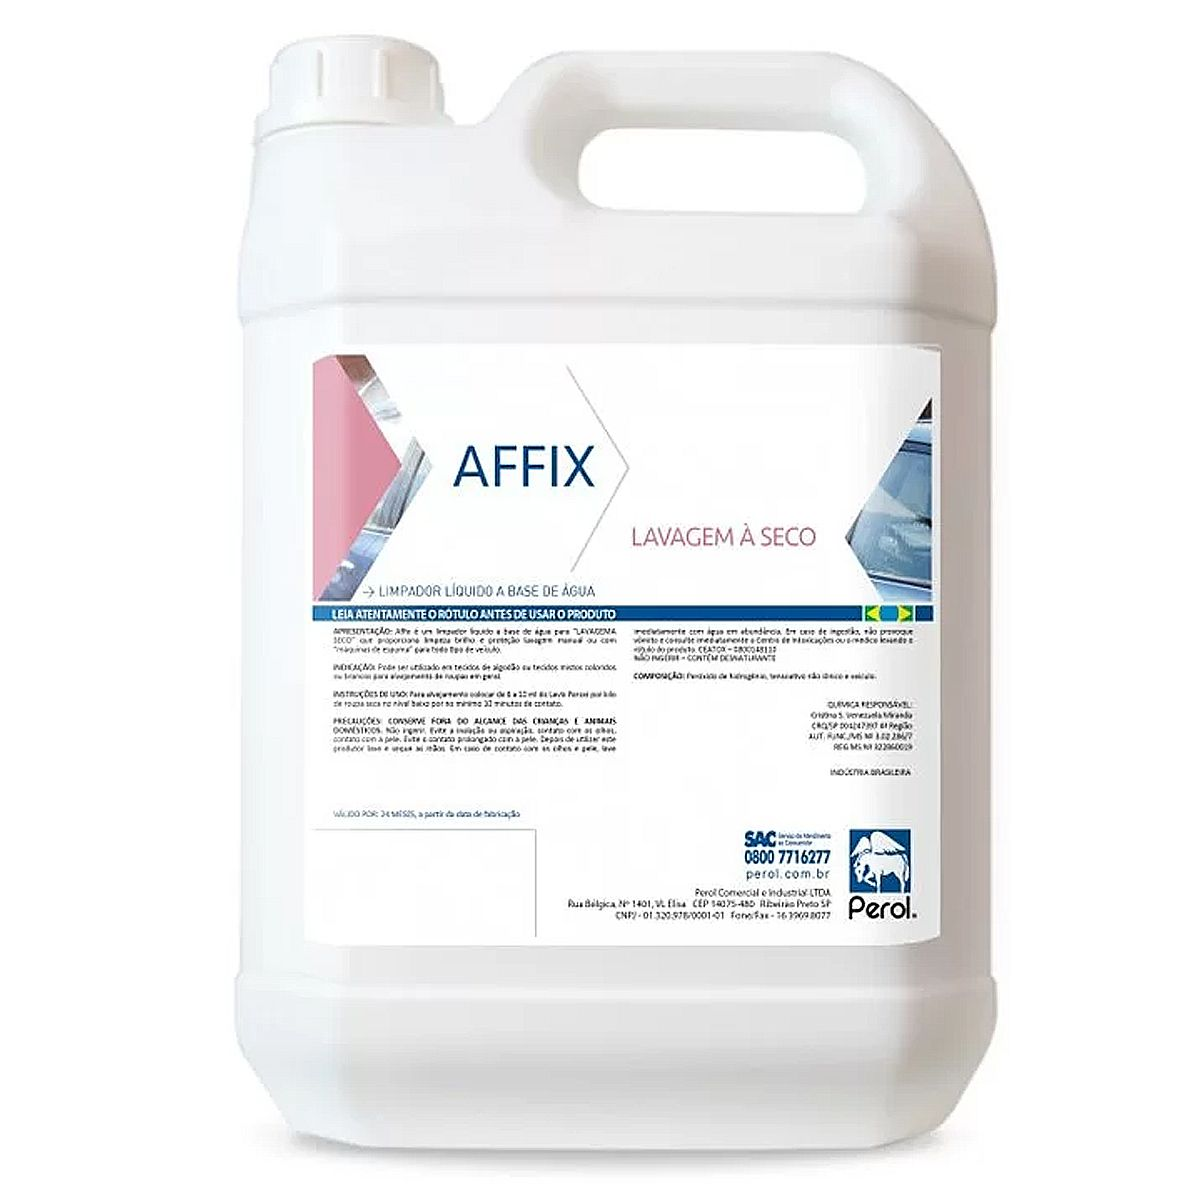 Lavagem a Seco Super Concentrado 1-40 Affix 5 Litros Perol